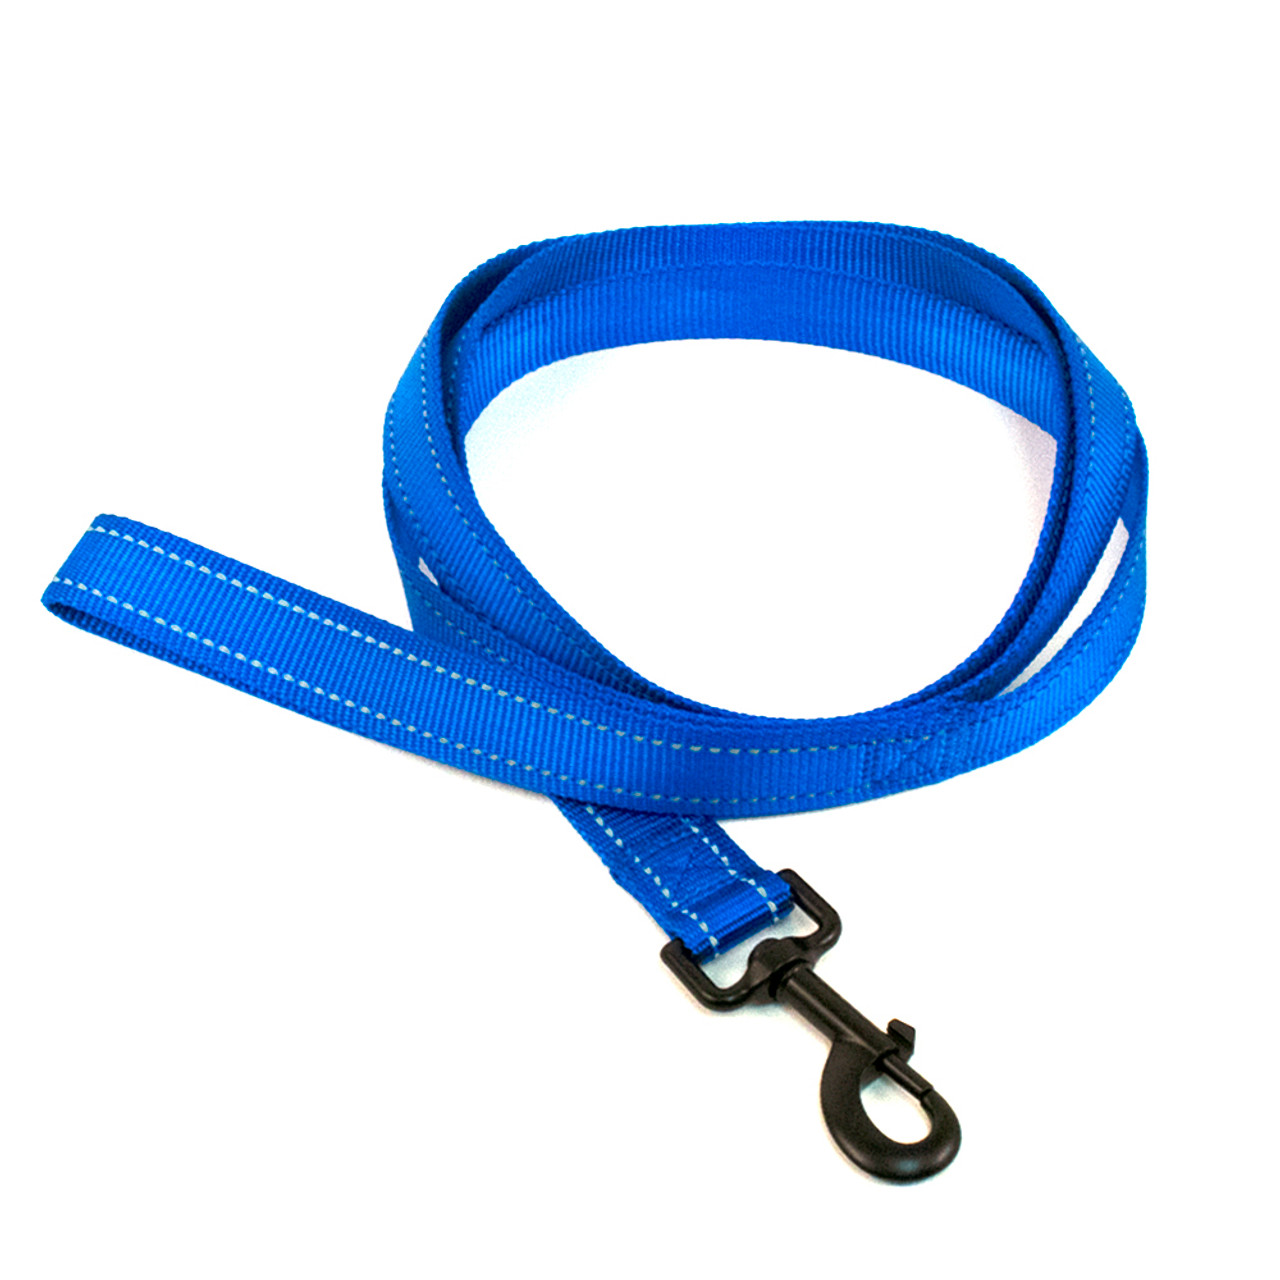 Fetch Your Own Adventure Nylon Reflective Dog Leash